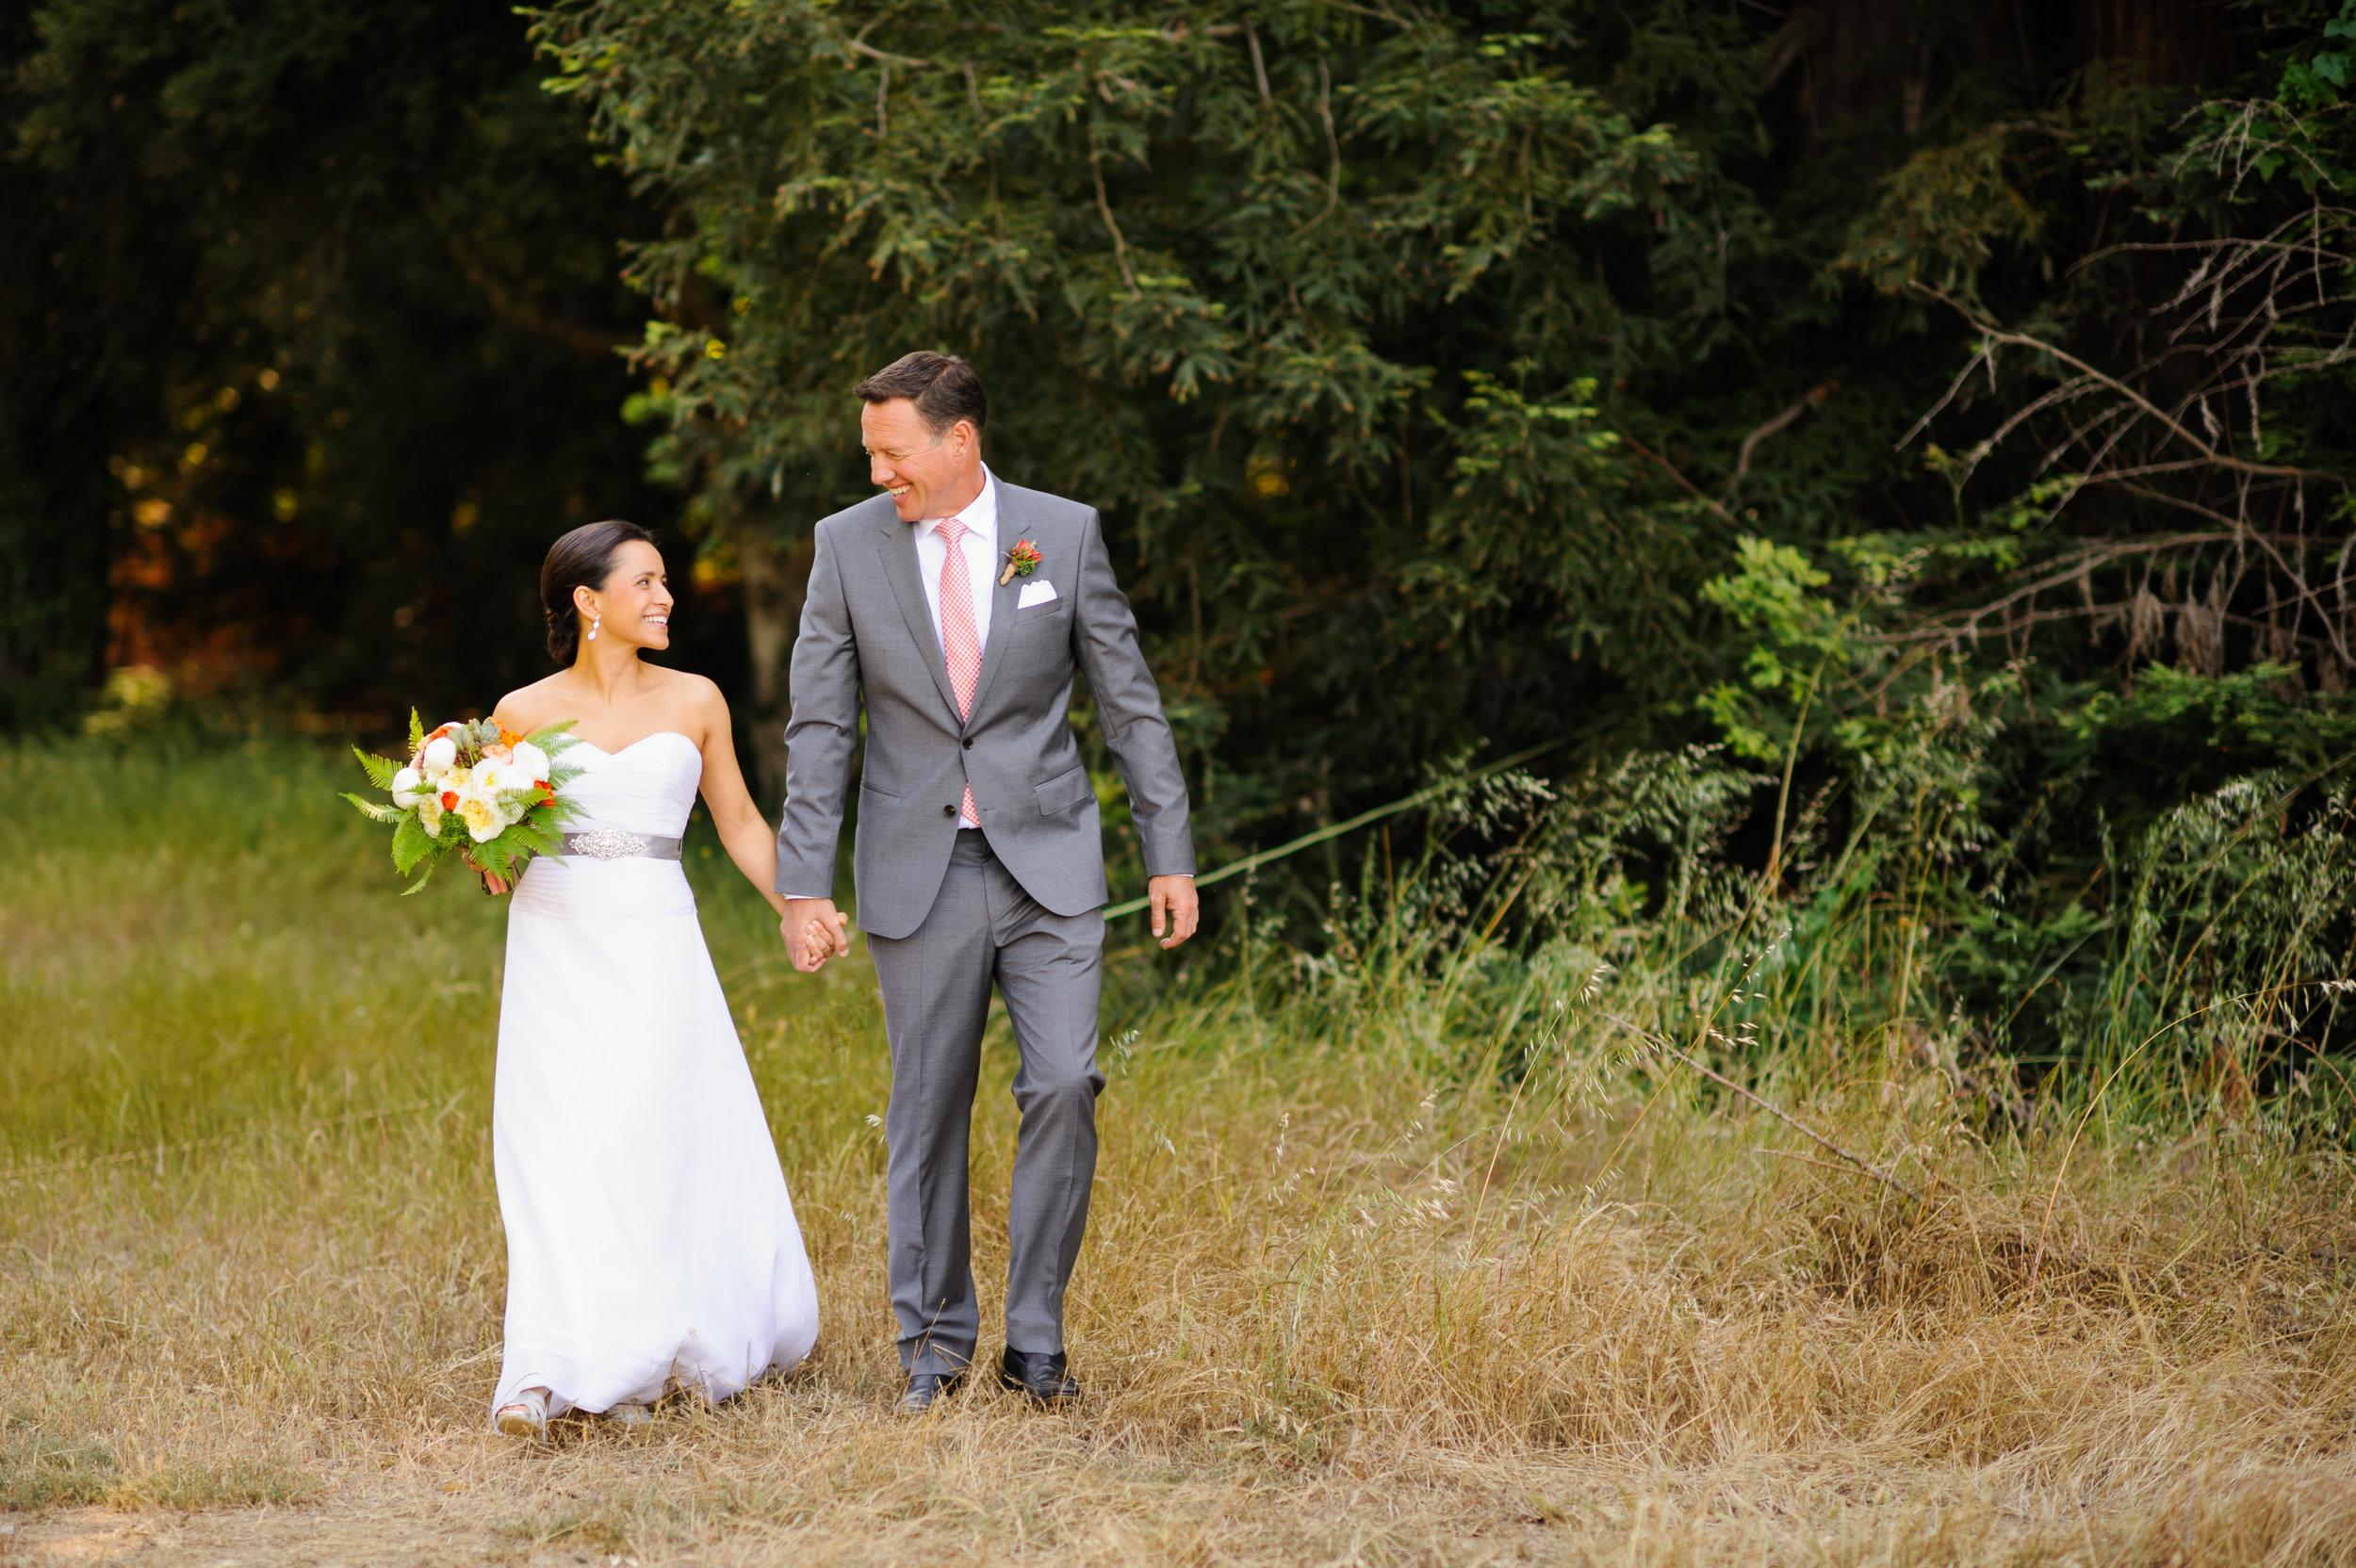 janet-jeremy-014-mountain-terrace-woodside-wedding-photographer-katherine-nicole-photography.JPG